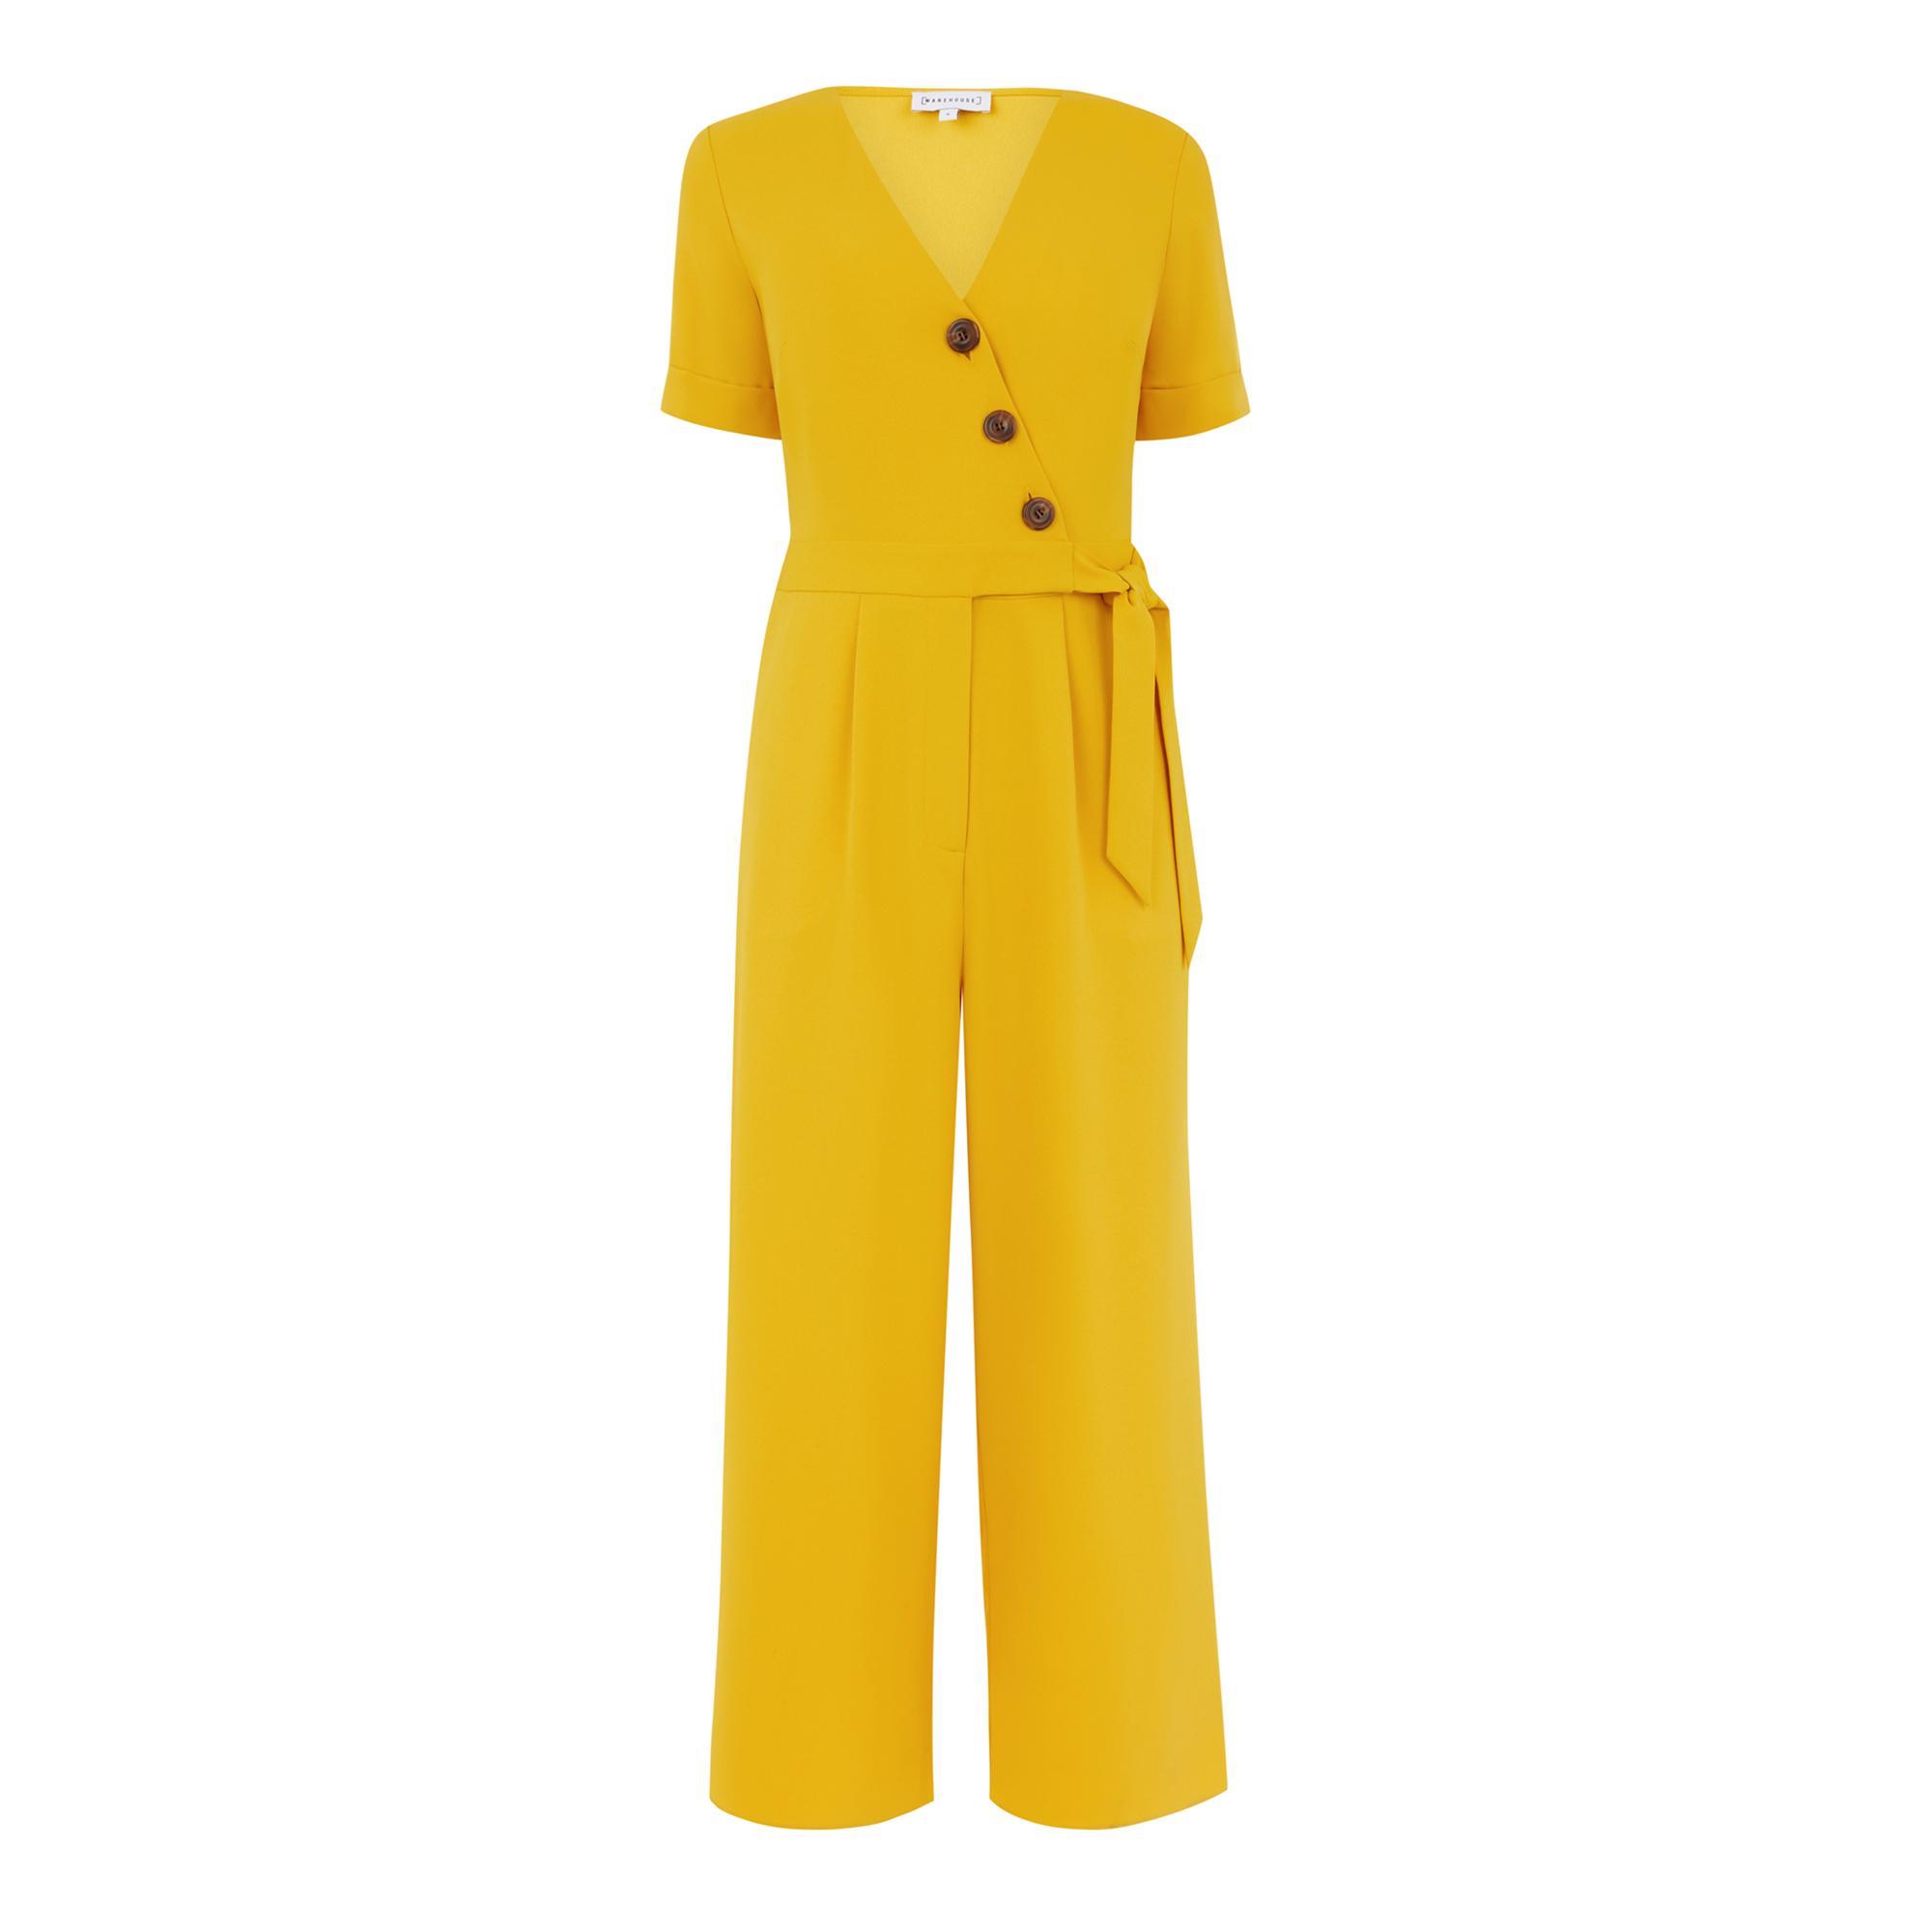 9b849ad158e Warehouse - Yellow Asymmetric Button Jumpsuit - Lyst. View fullscreen